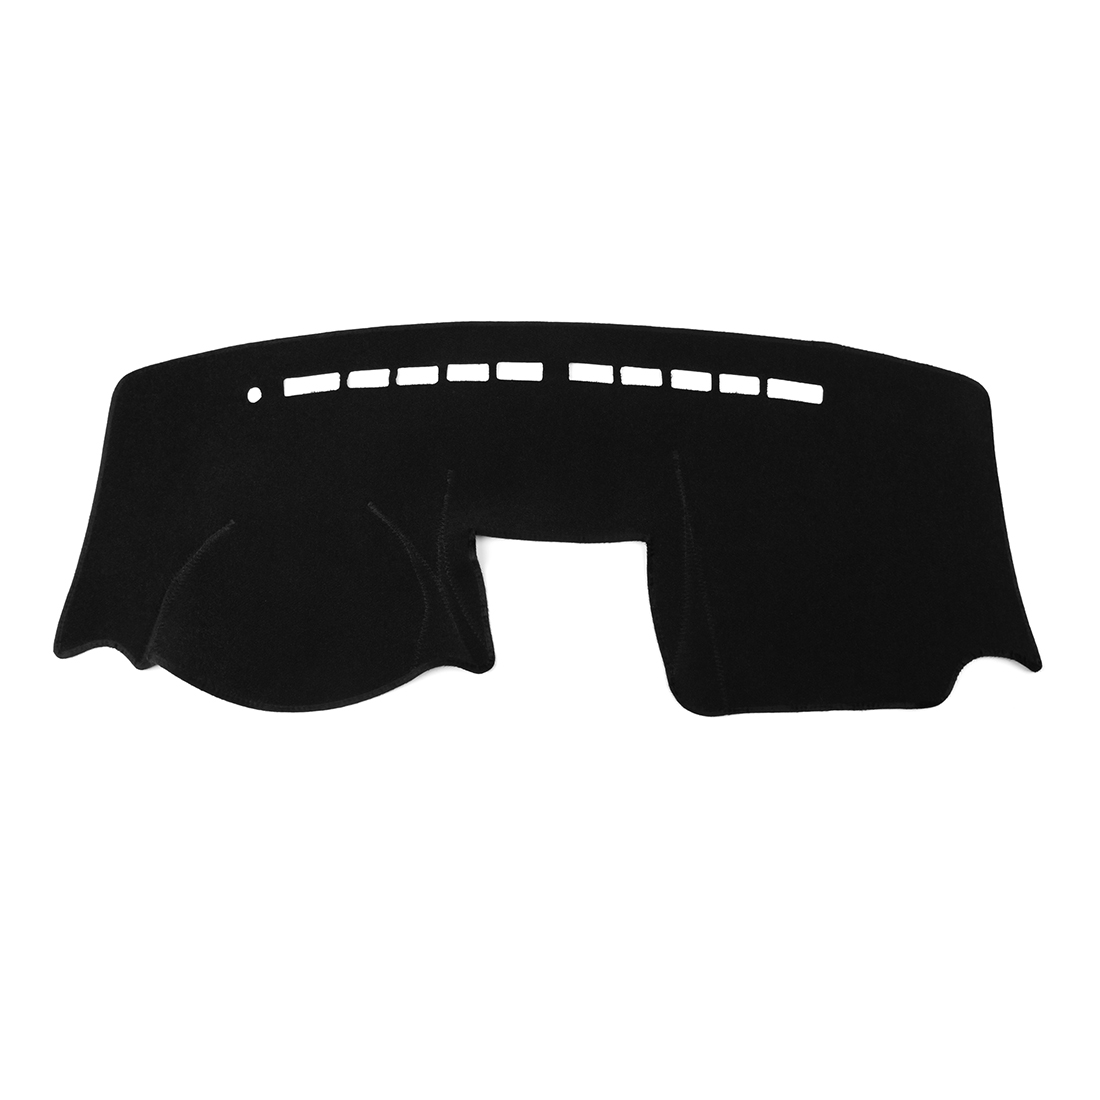 Car Dashboard Cover Nonslip Black Dash Mat Sun Pad for 2009-2012 Suzuki SX4